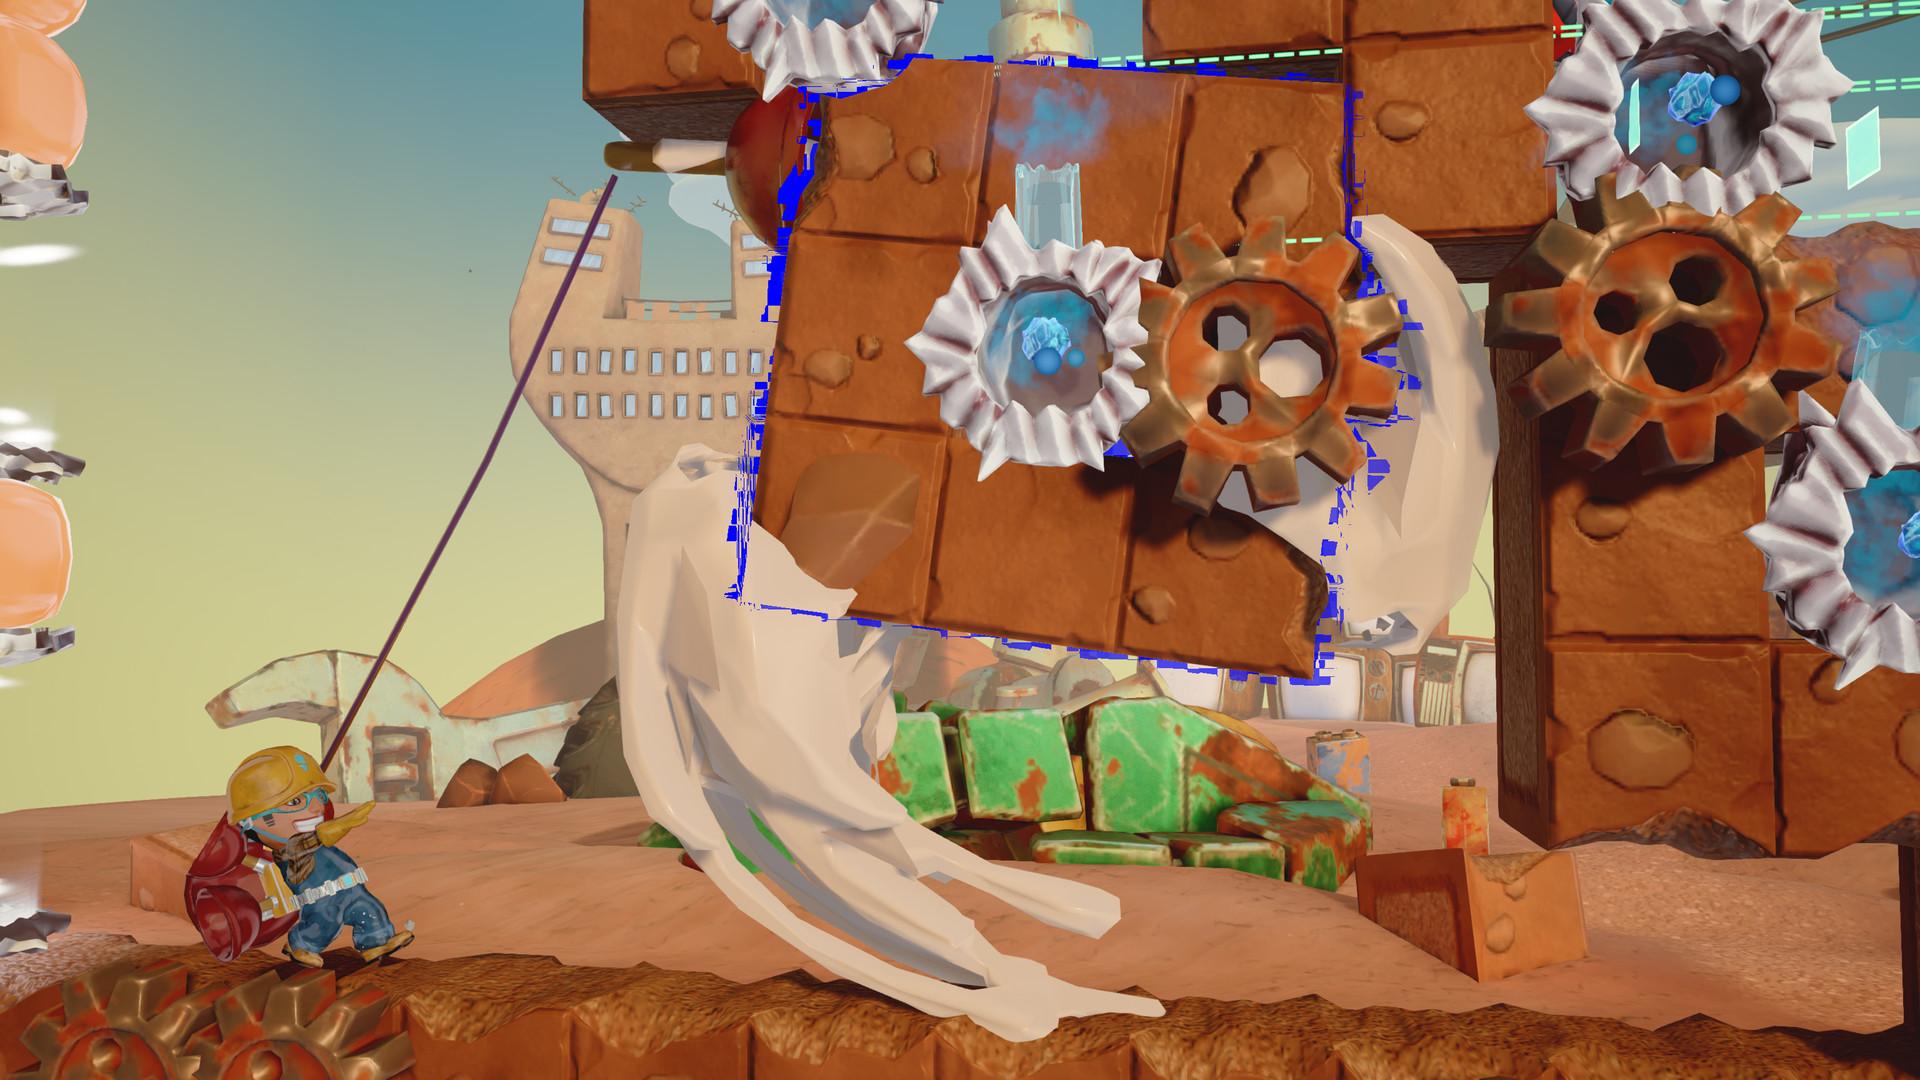 georifters gameplay wallpaper 73513